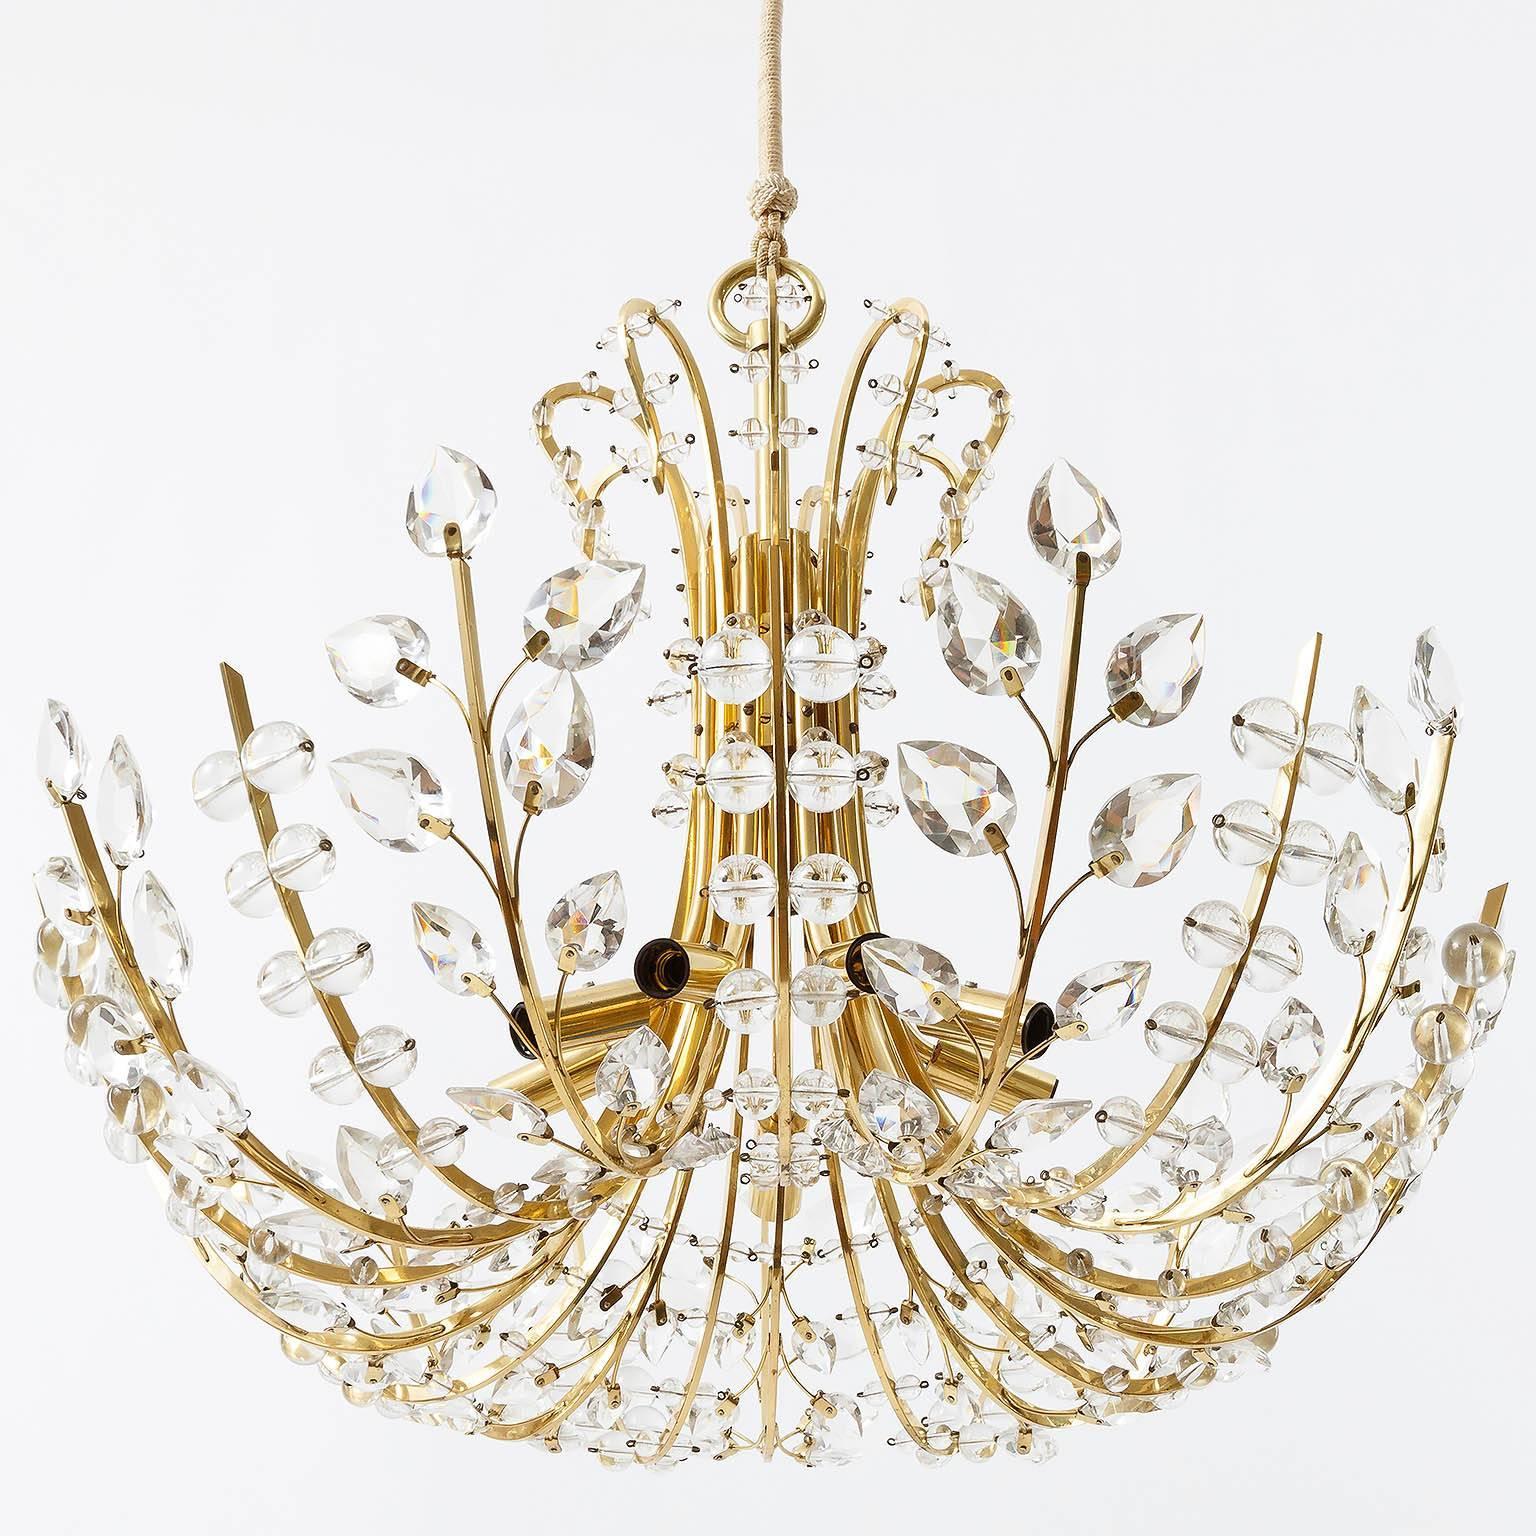 Lobmeyr chandelier ambassador oswald haerdtl brass glass lobmeyr chandelier ambassador oswald haerdtl brass glass austria 1955 for sale at 1stdibs aloadofball Image collections